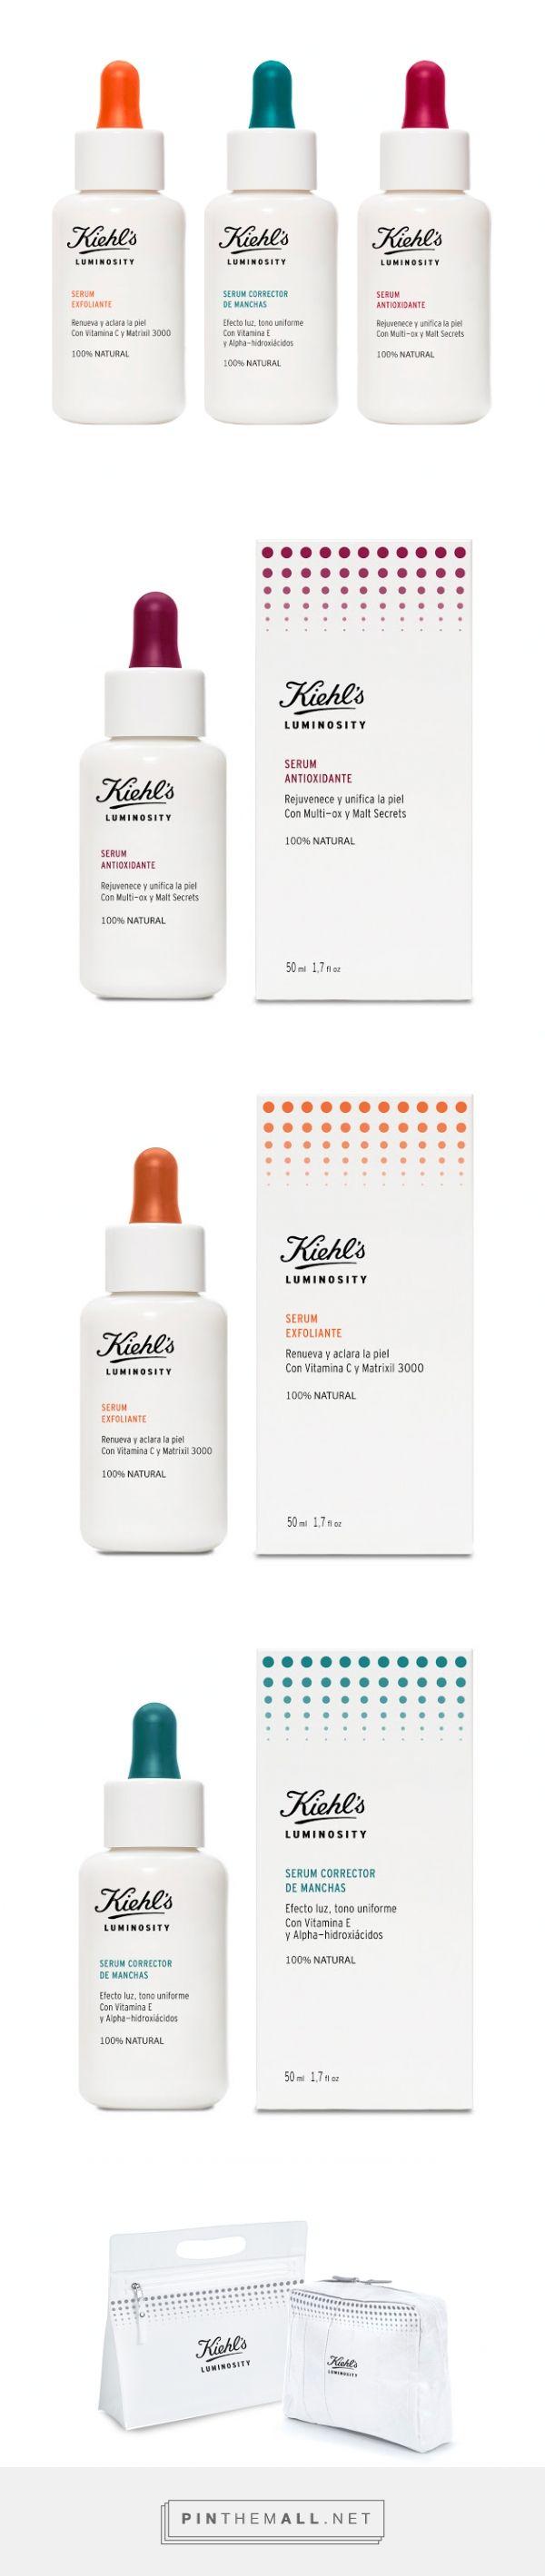 Kiehl\'s Luminosity - serum